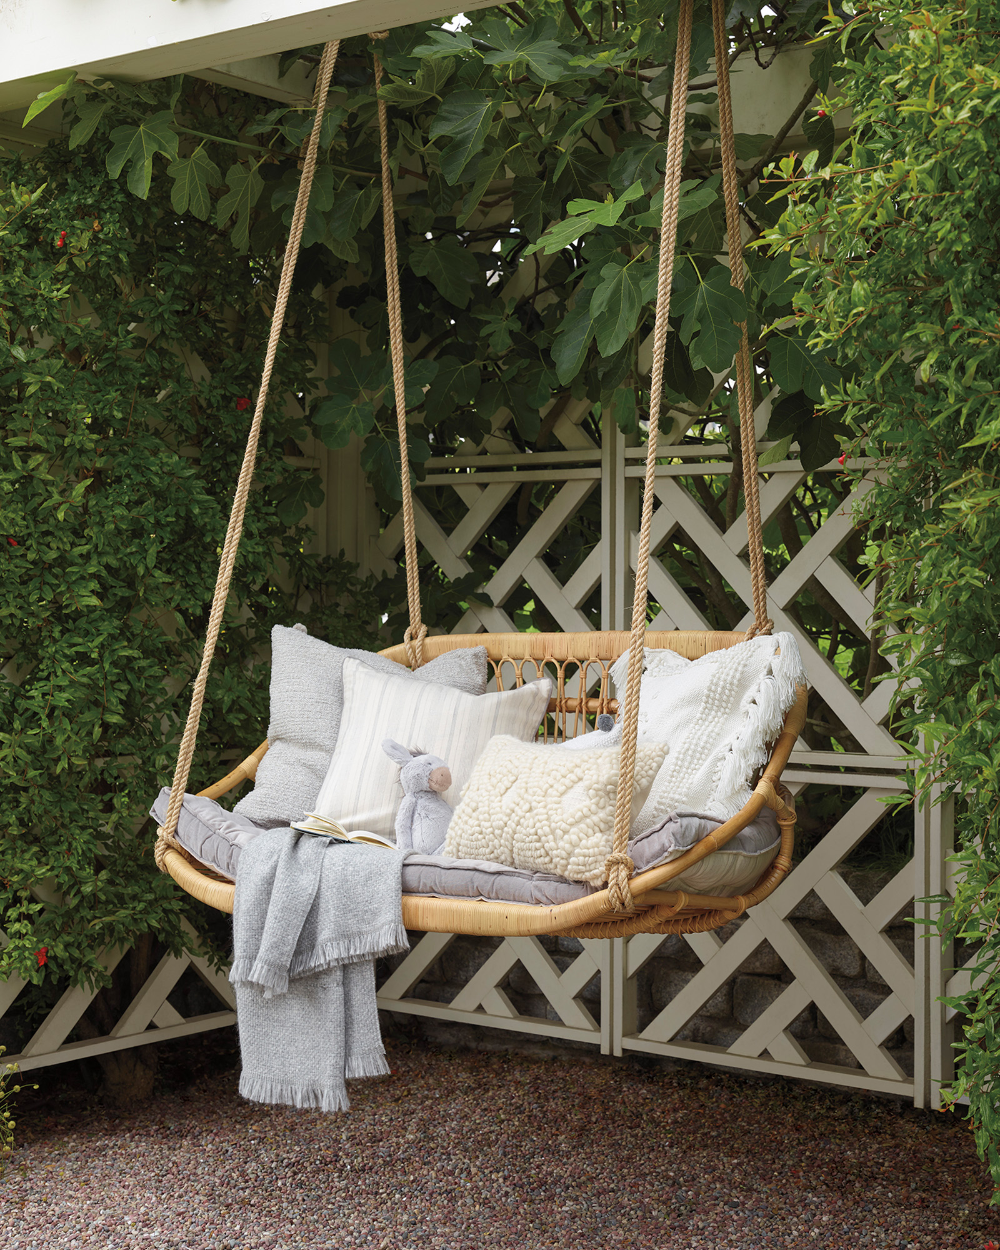 Hanging Rattan Bench in 2020 | Hanging chair outdoor ...